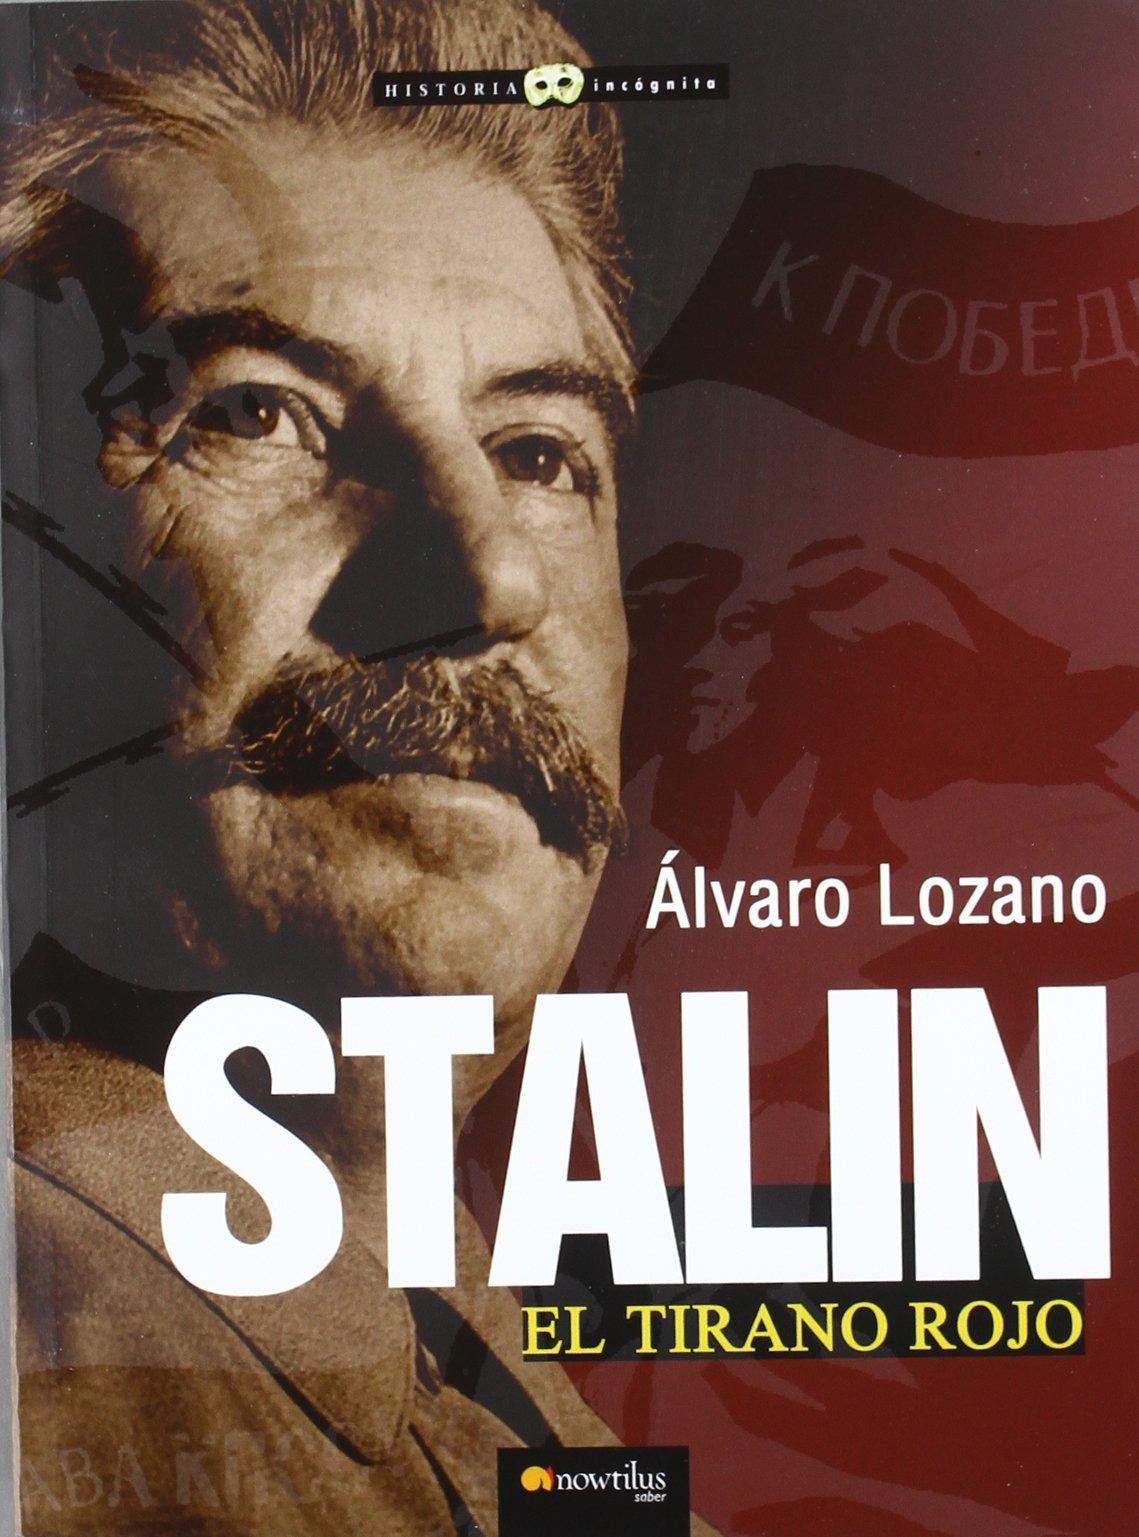 Stalin, el tirano rojo ISBN-13 9788499673226